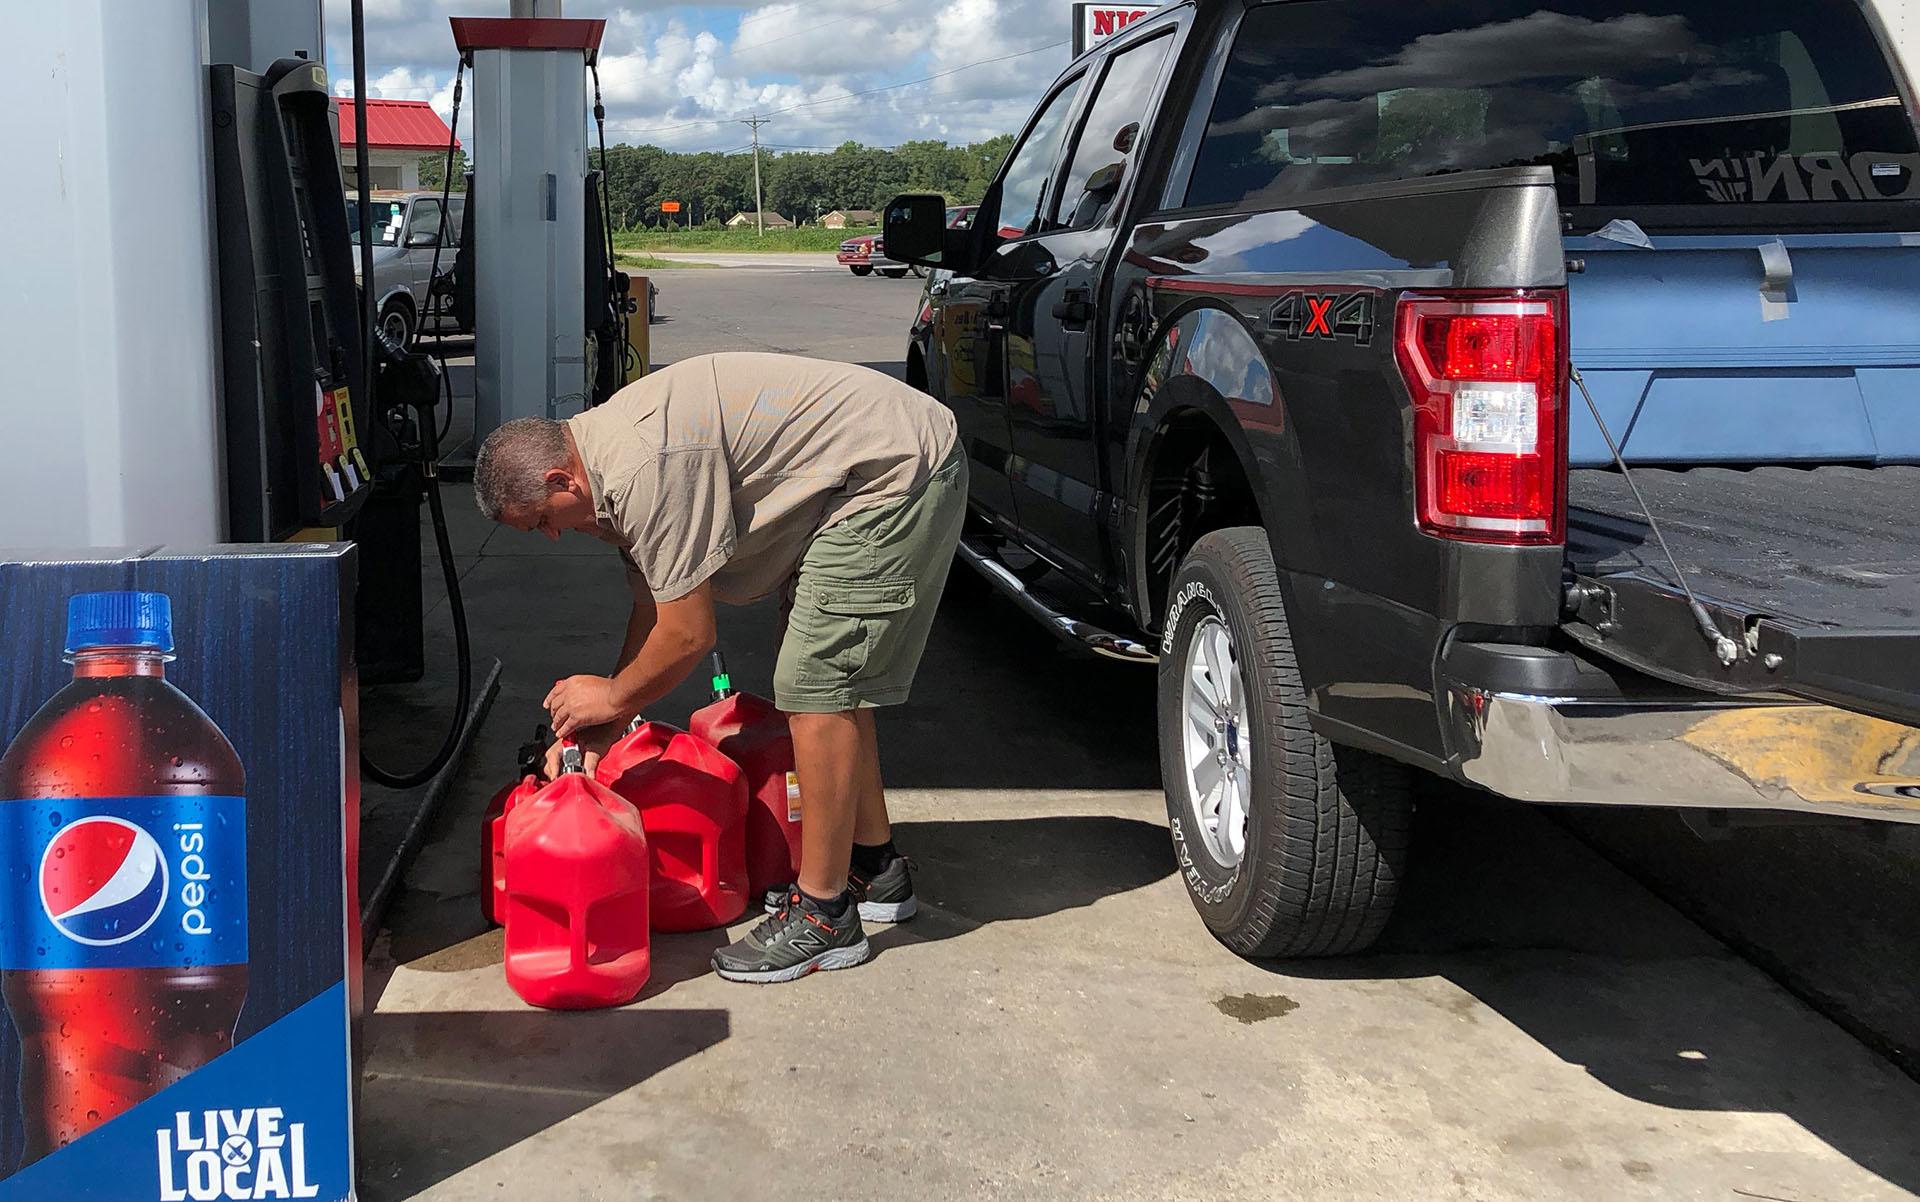 Trent Bullard llena contenedores de gasolina para su generador antes del huracán Florence en Pembroke, Carolina del Norte (REUTERS/Anna Driver)